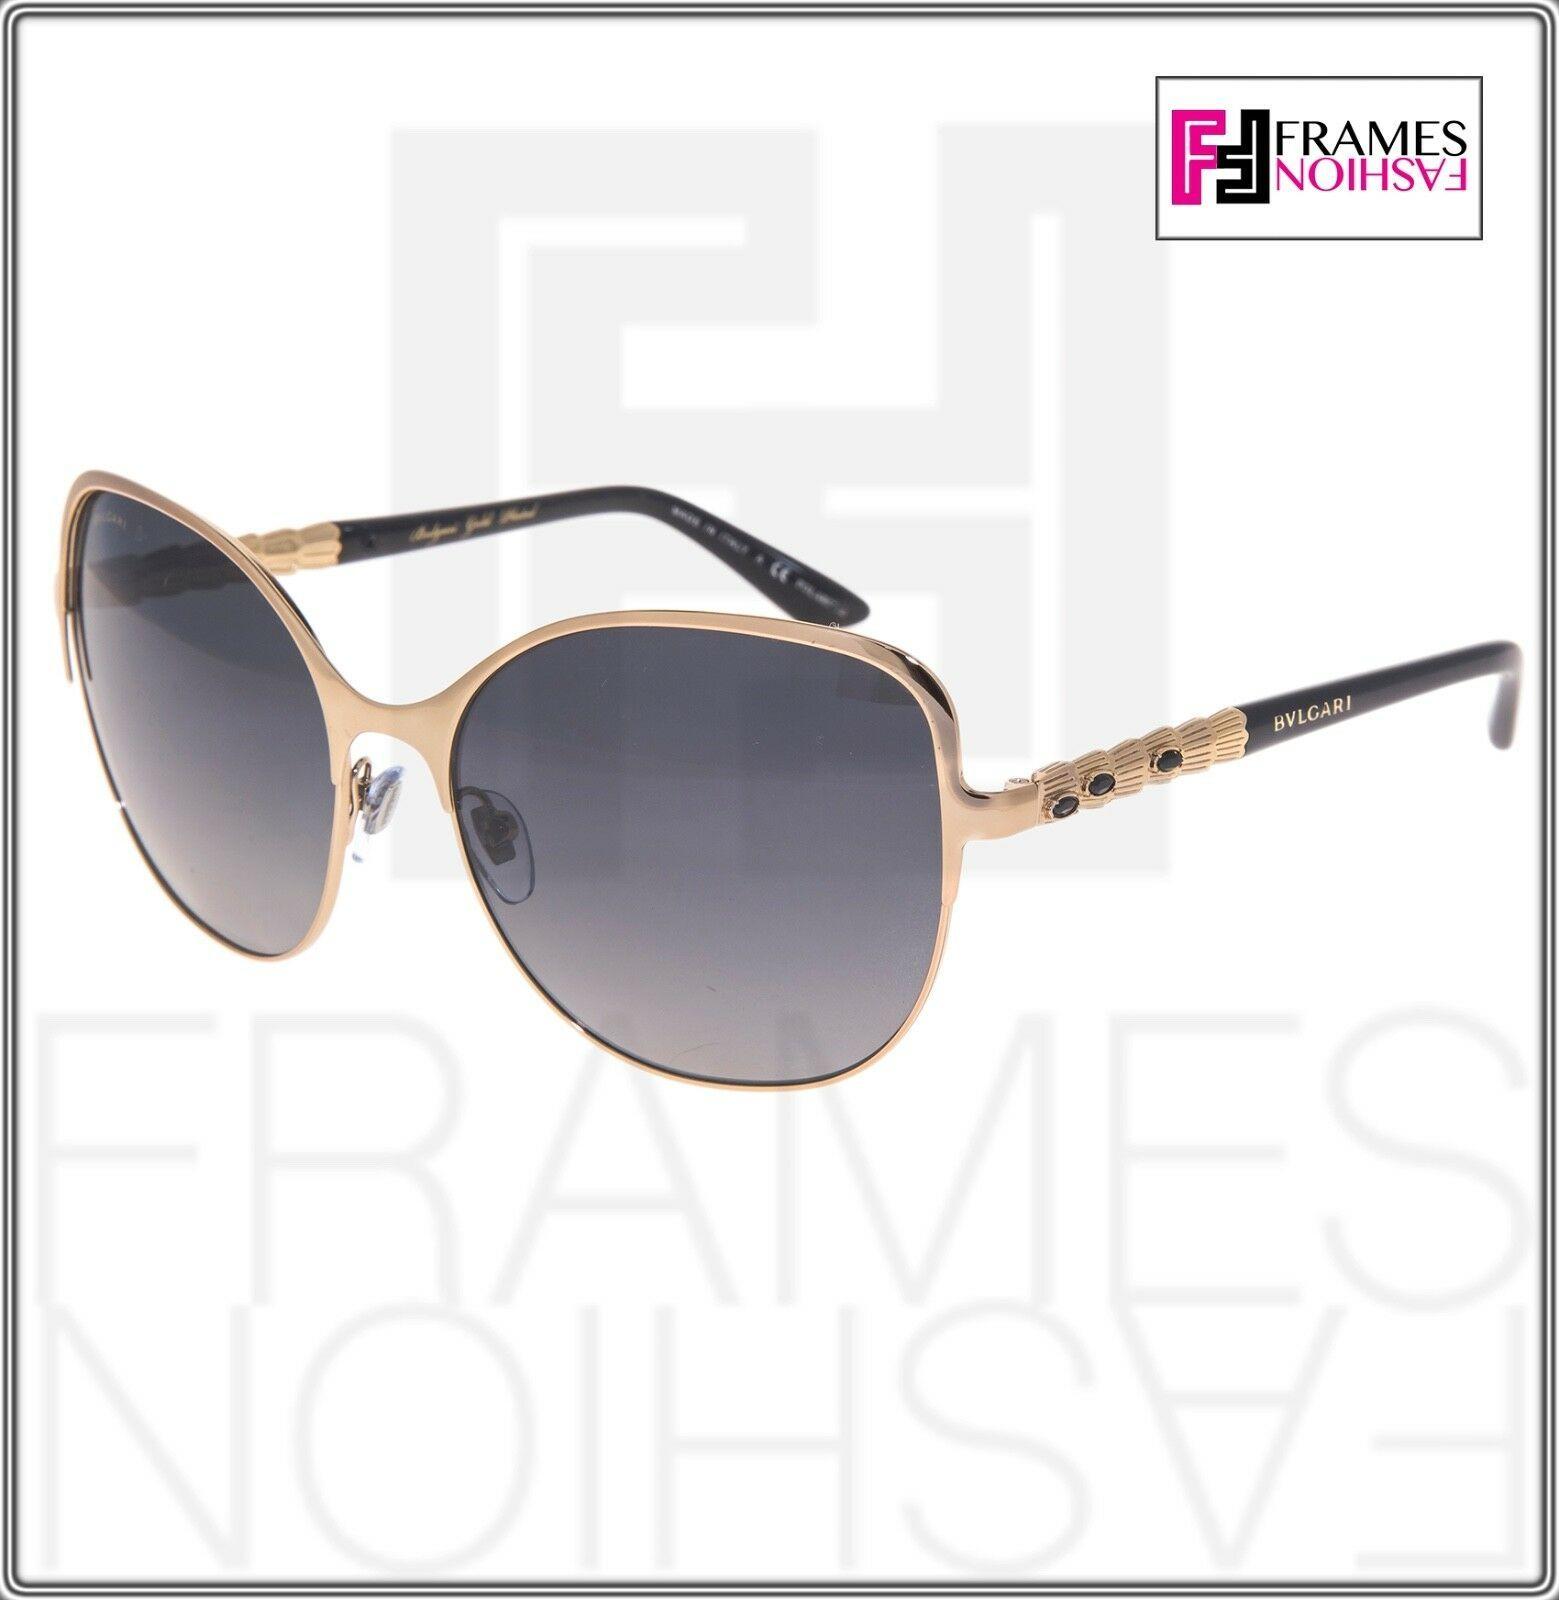 BVLGARI Le Gemme BV6078KB Black Gold 18K Plated POLARIZED Sunglasses 6078 Women image 7